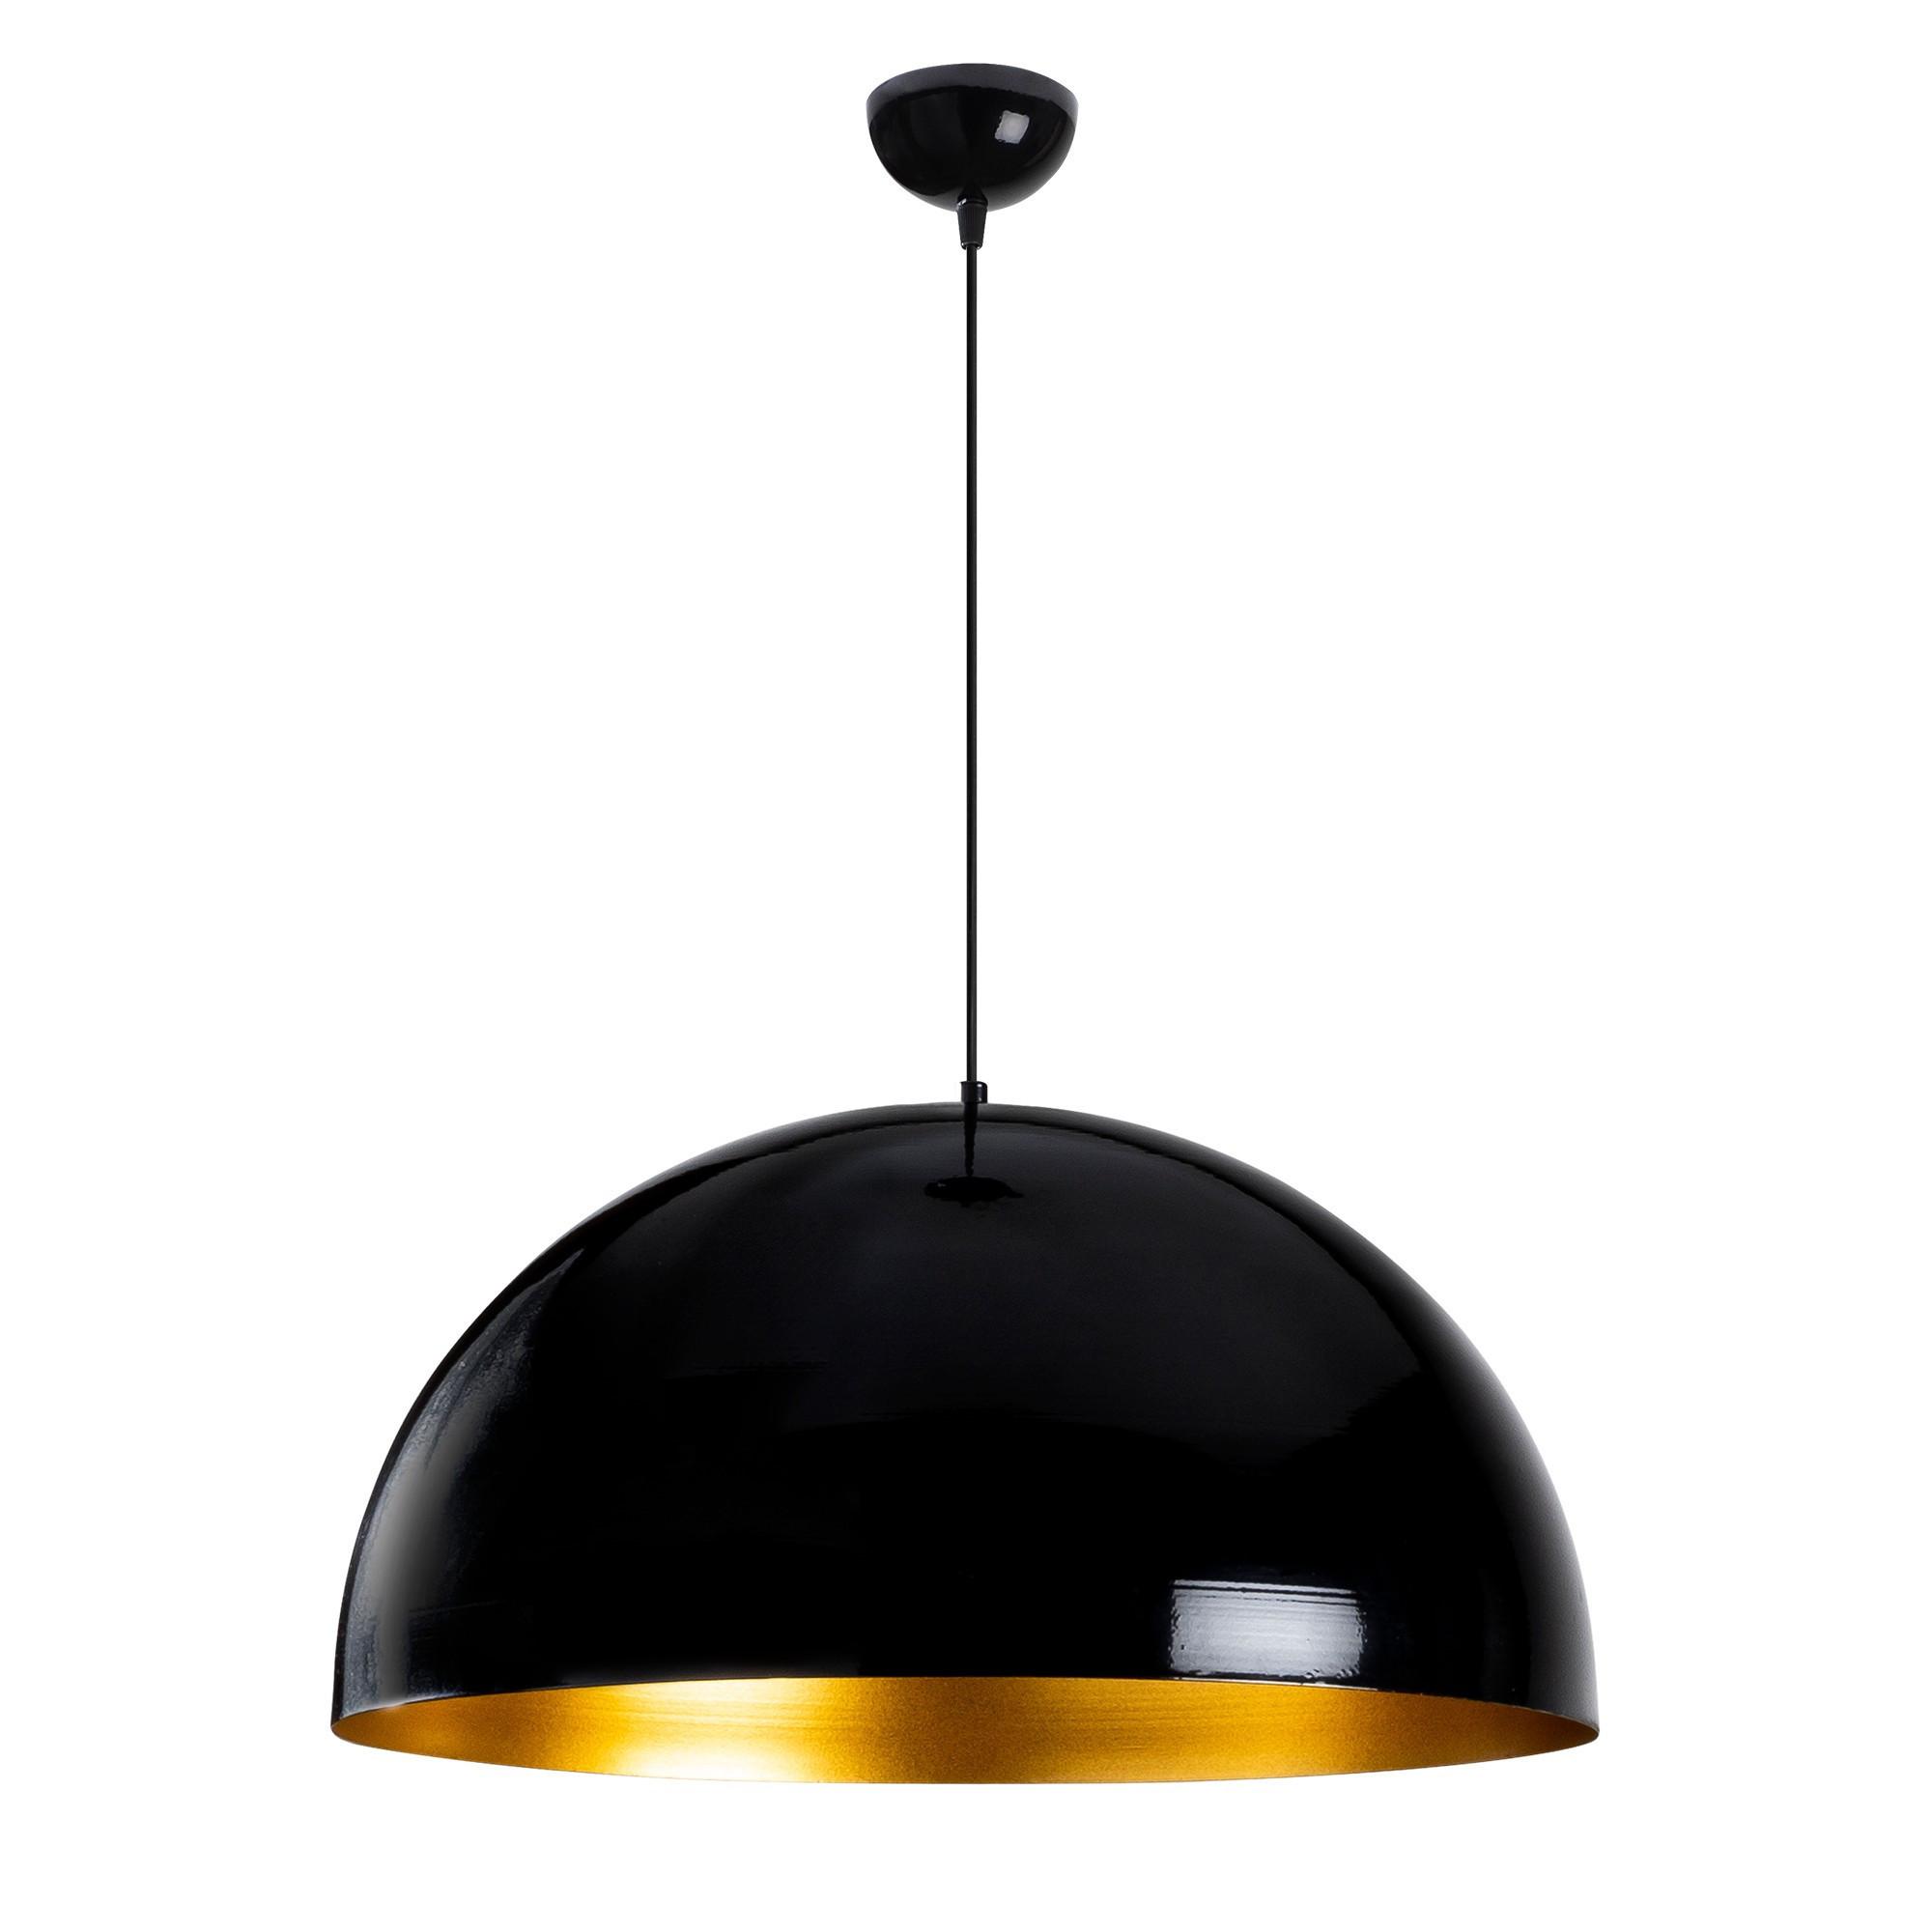 Pendant Lamp Berceste 237-S | Black